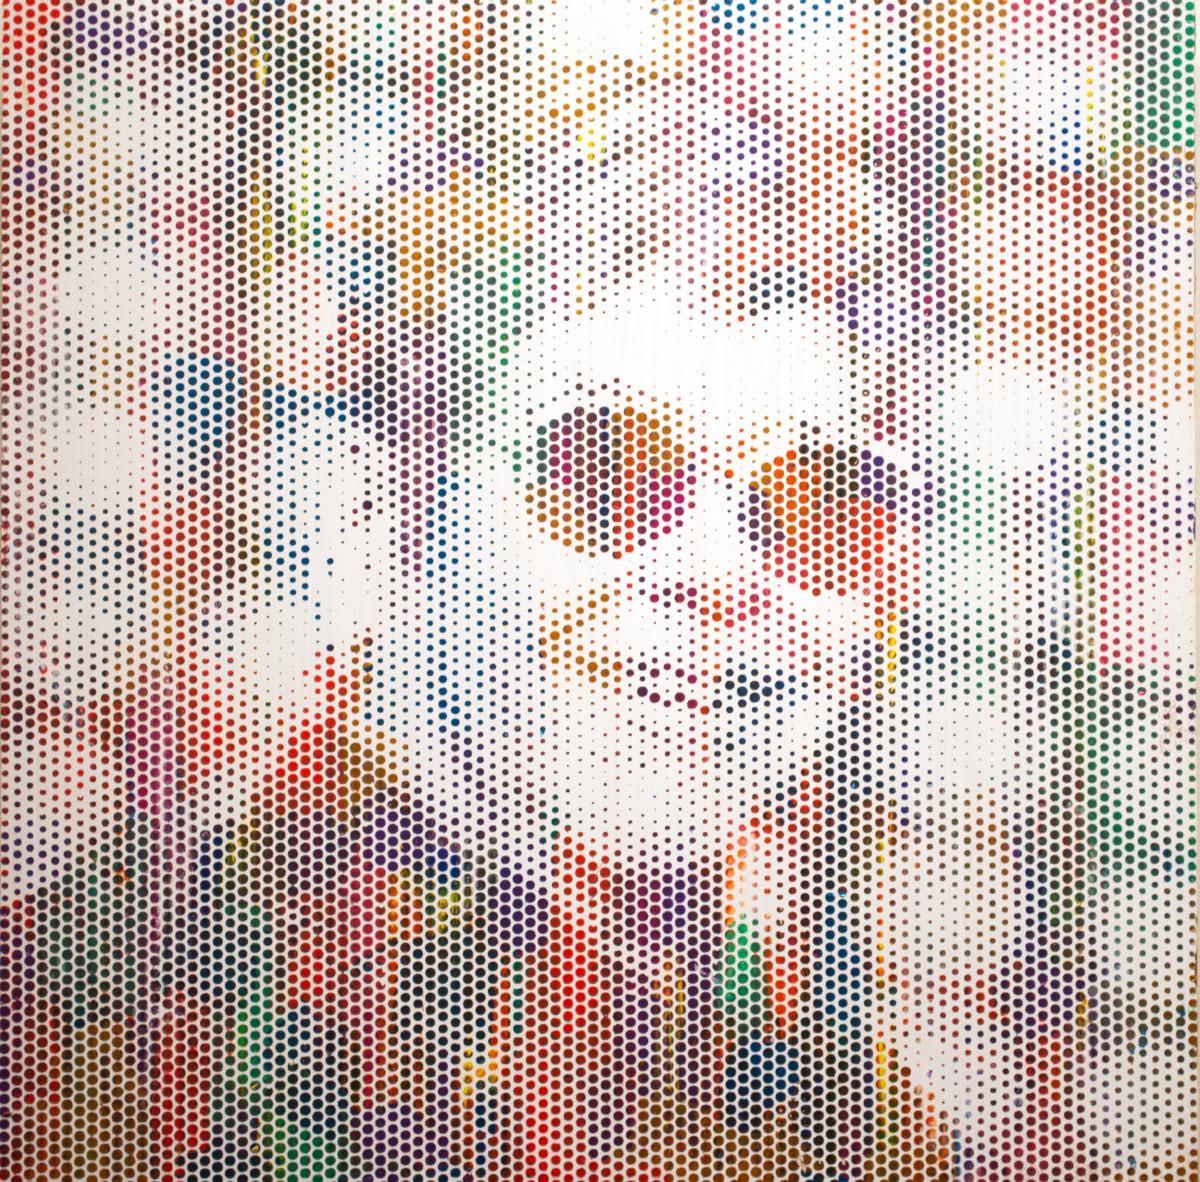 Elton John I by Sean Christopher Ward